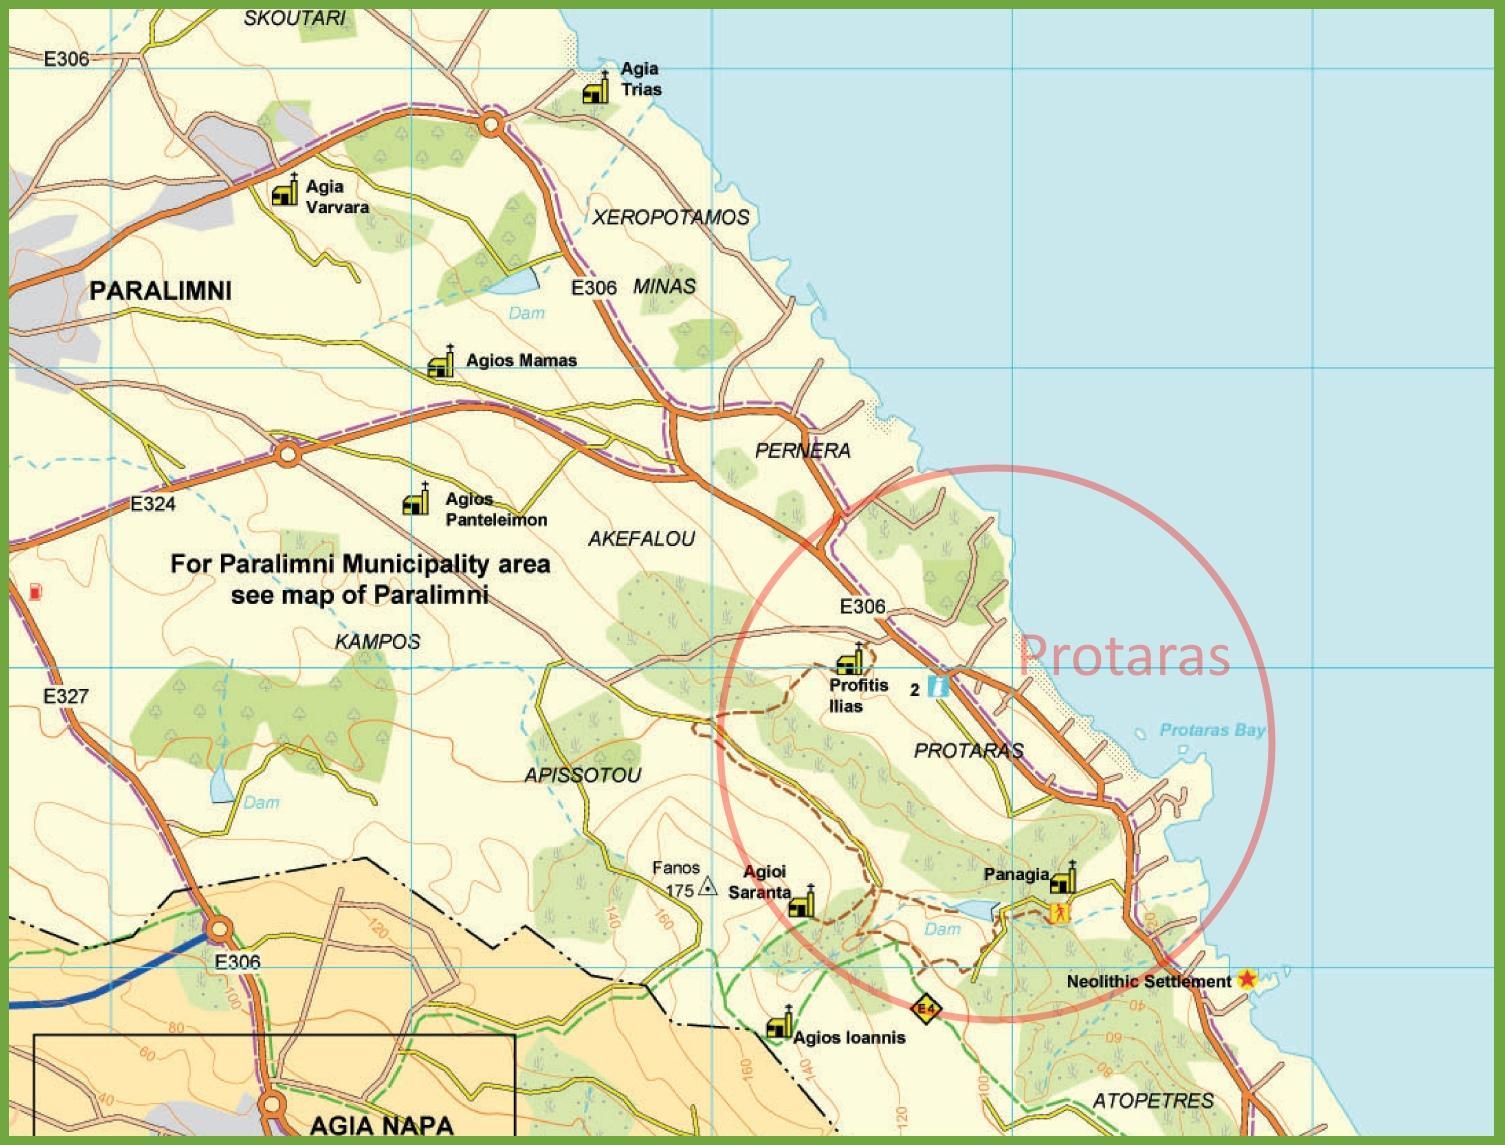 Map Of Cyprus Showing Protaras Street Map Of Protaras Cyprus